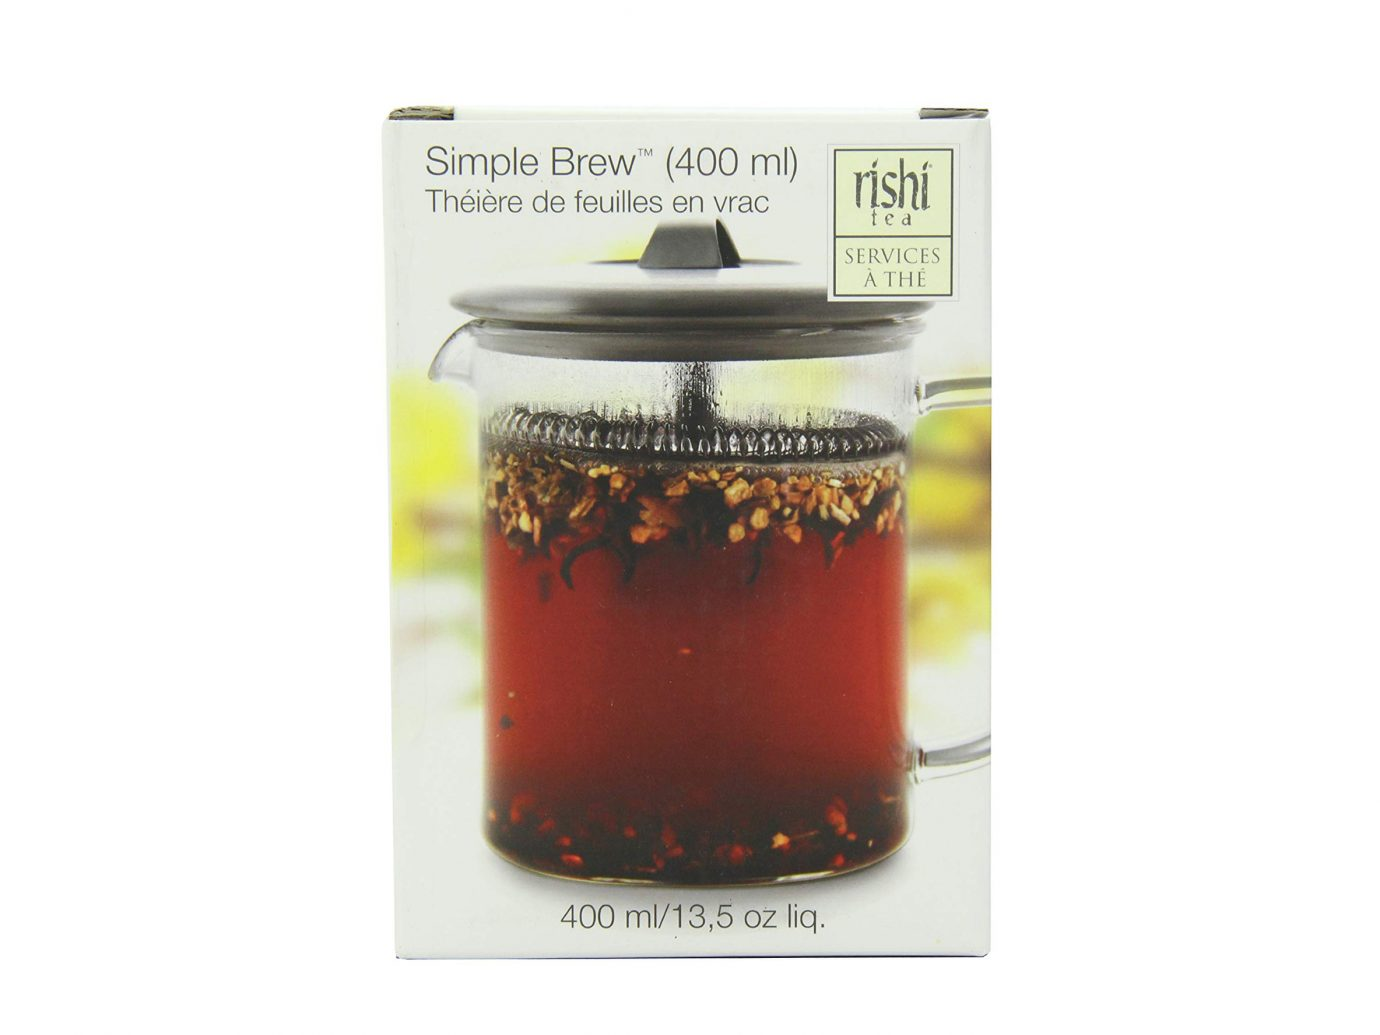 Rishi Tea Simple Brew Loose Leaf Teapot